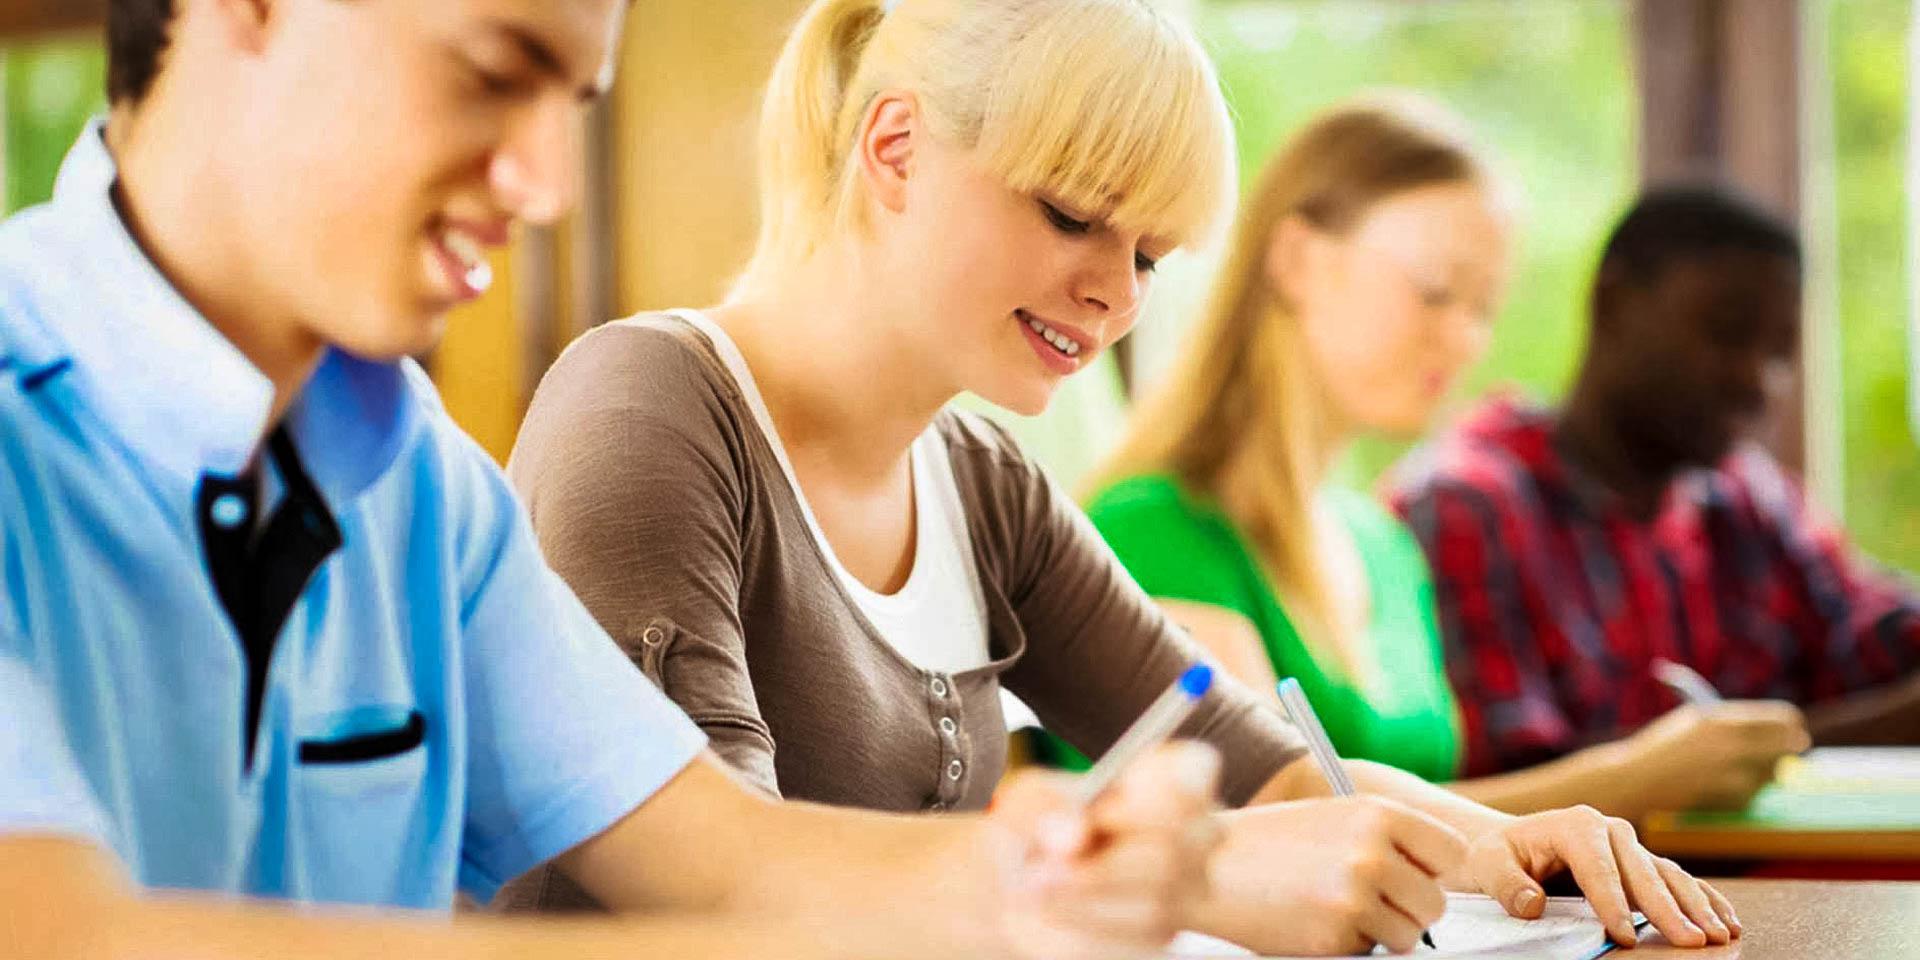 HiSET Orientation-High School Equivalency Test Session 3